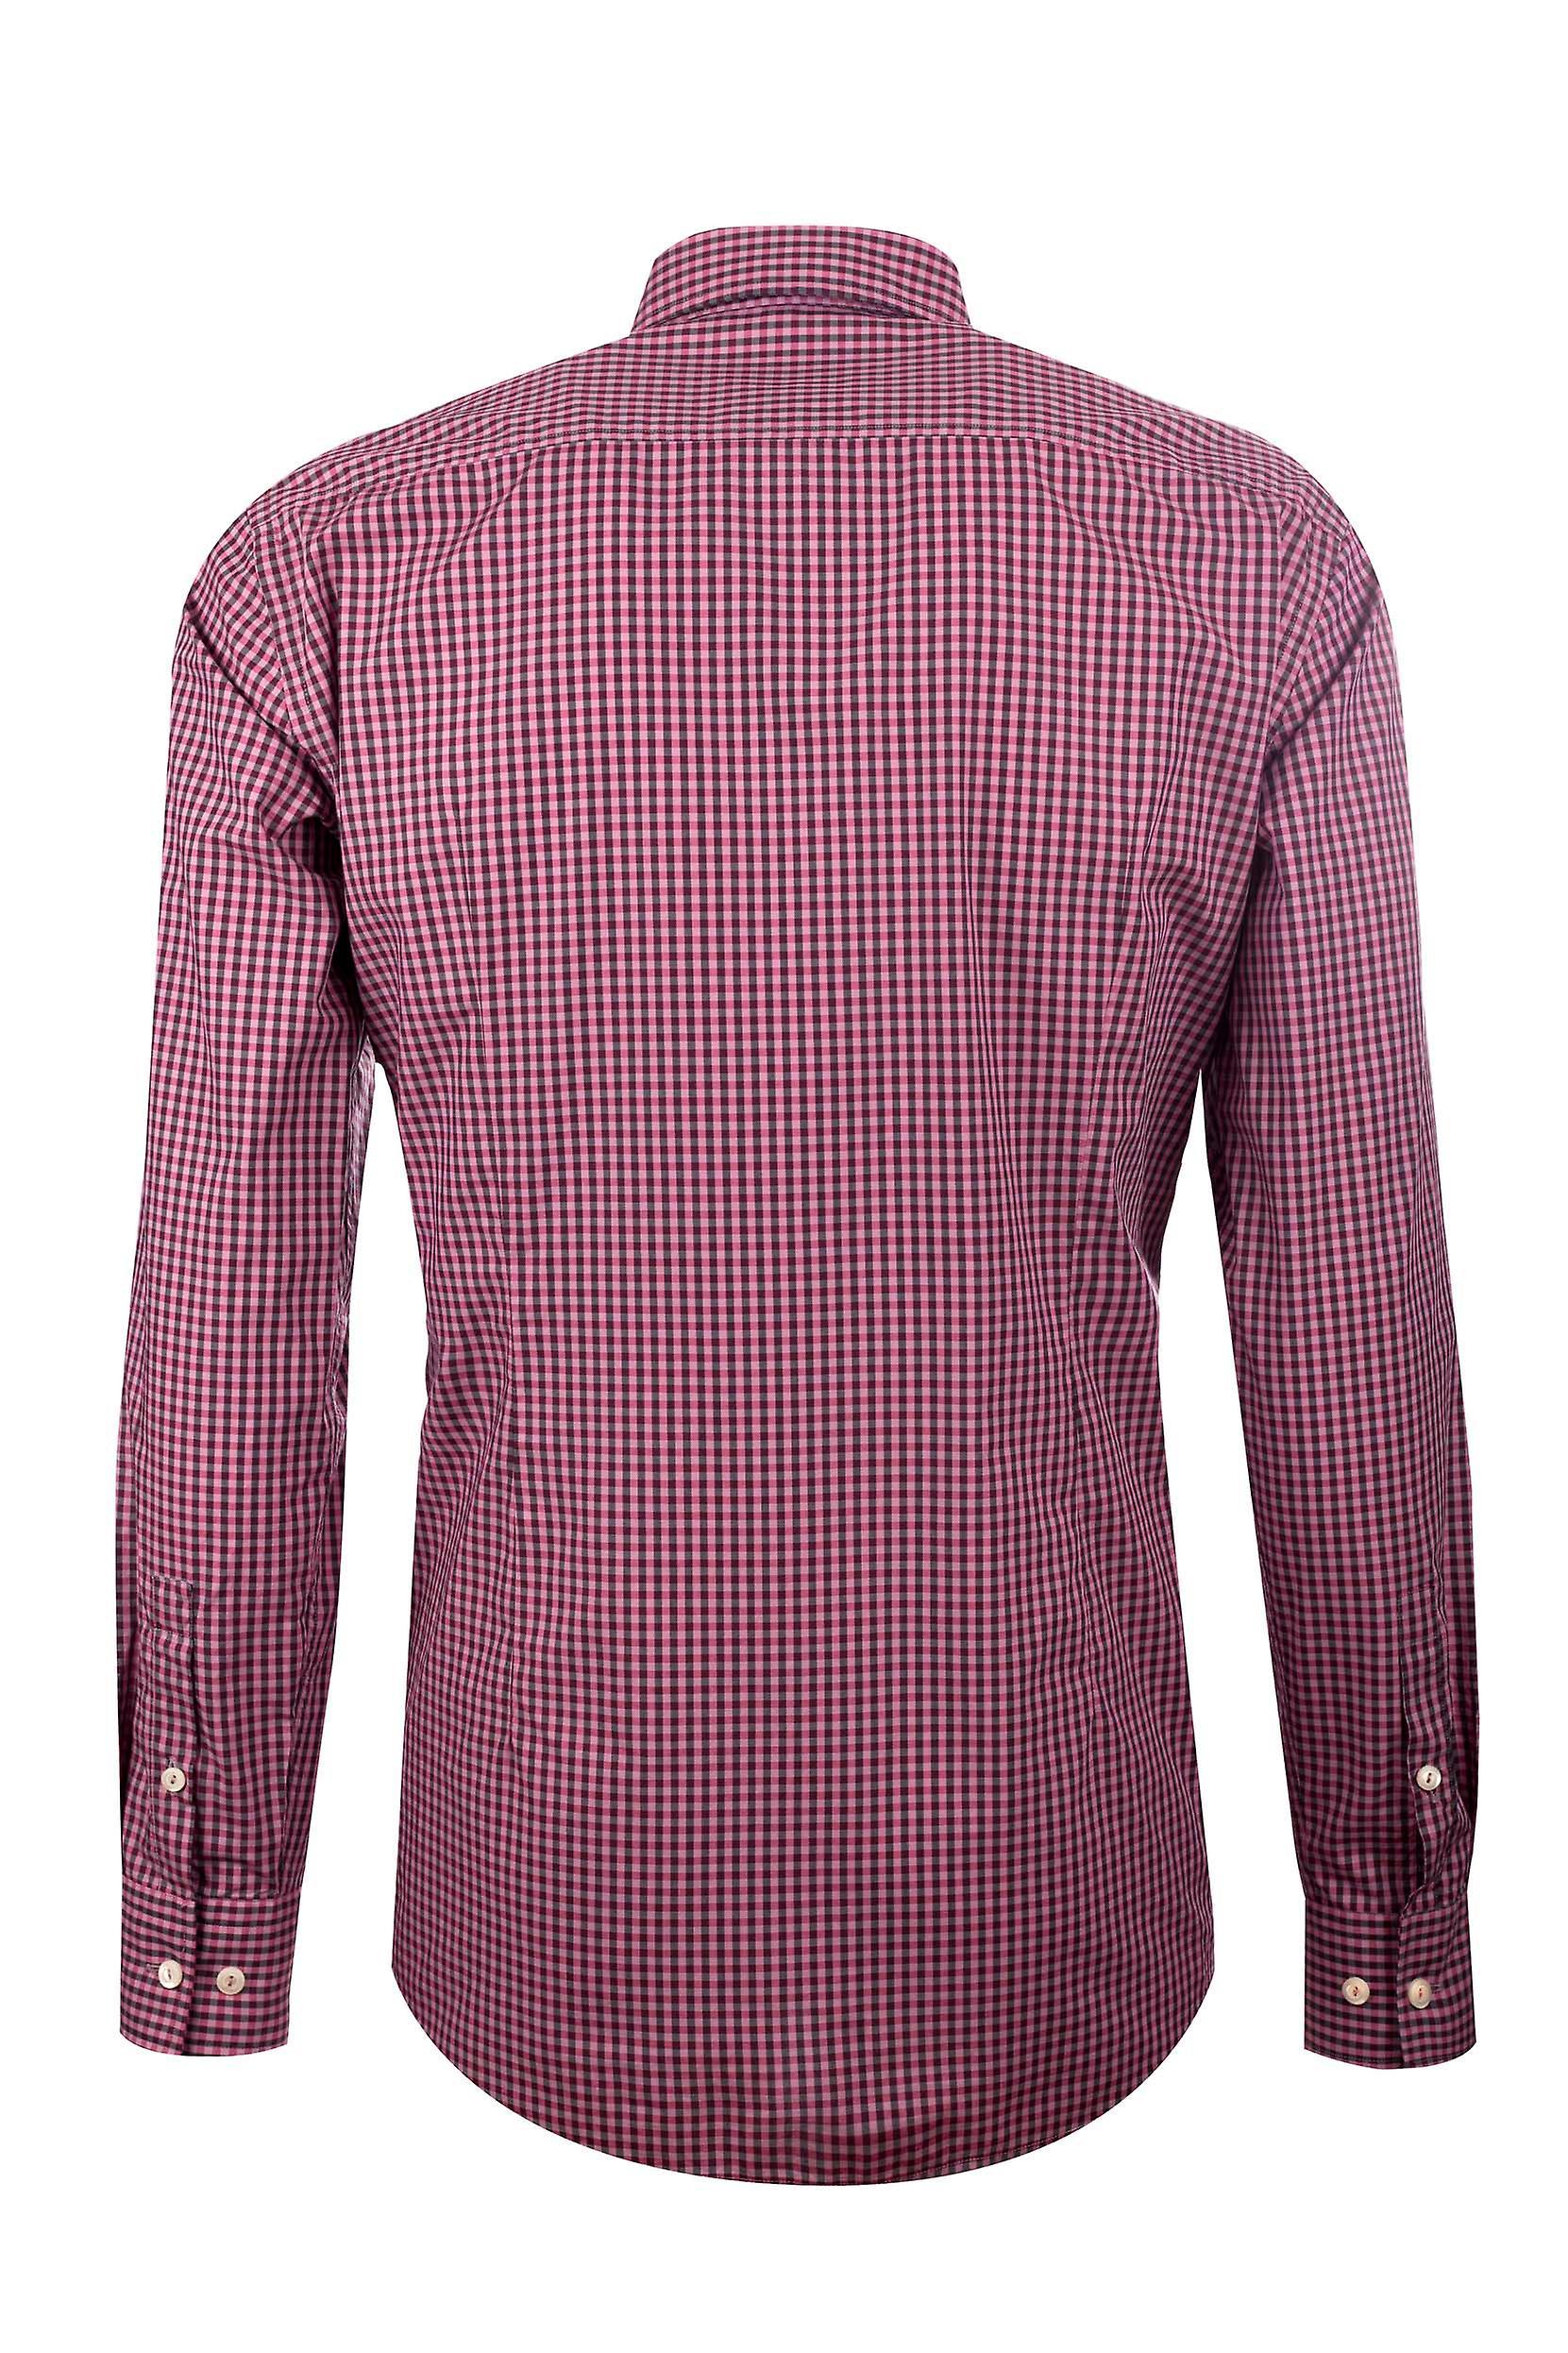 Fabio Giovanni Petrucci Shirt - Mens High Quality Italian Poplin Cotton Classic Check & Button-Down Collar Shirt